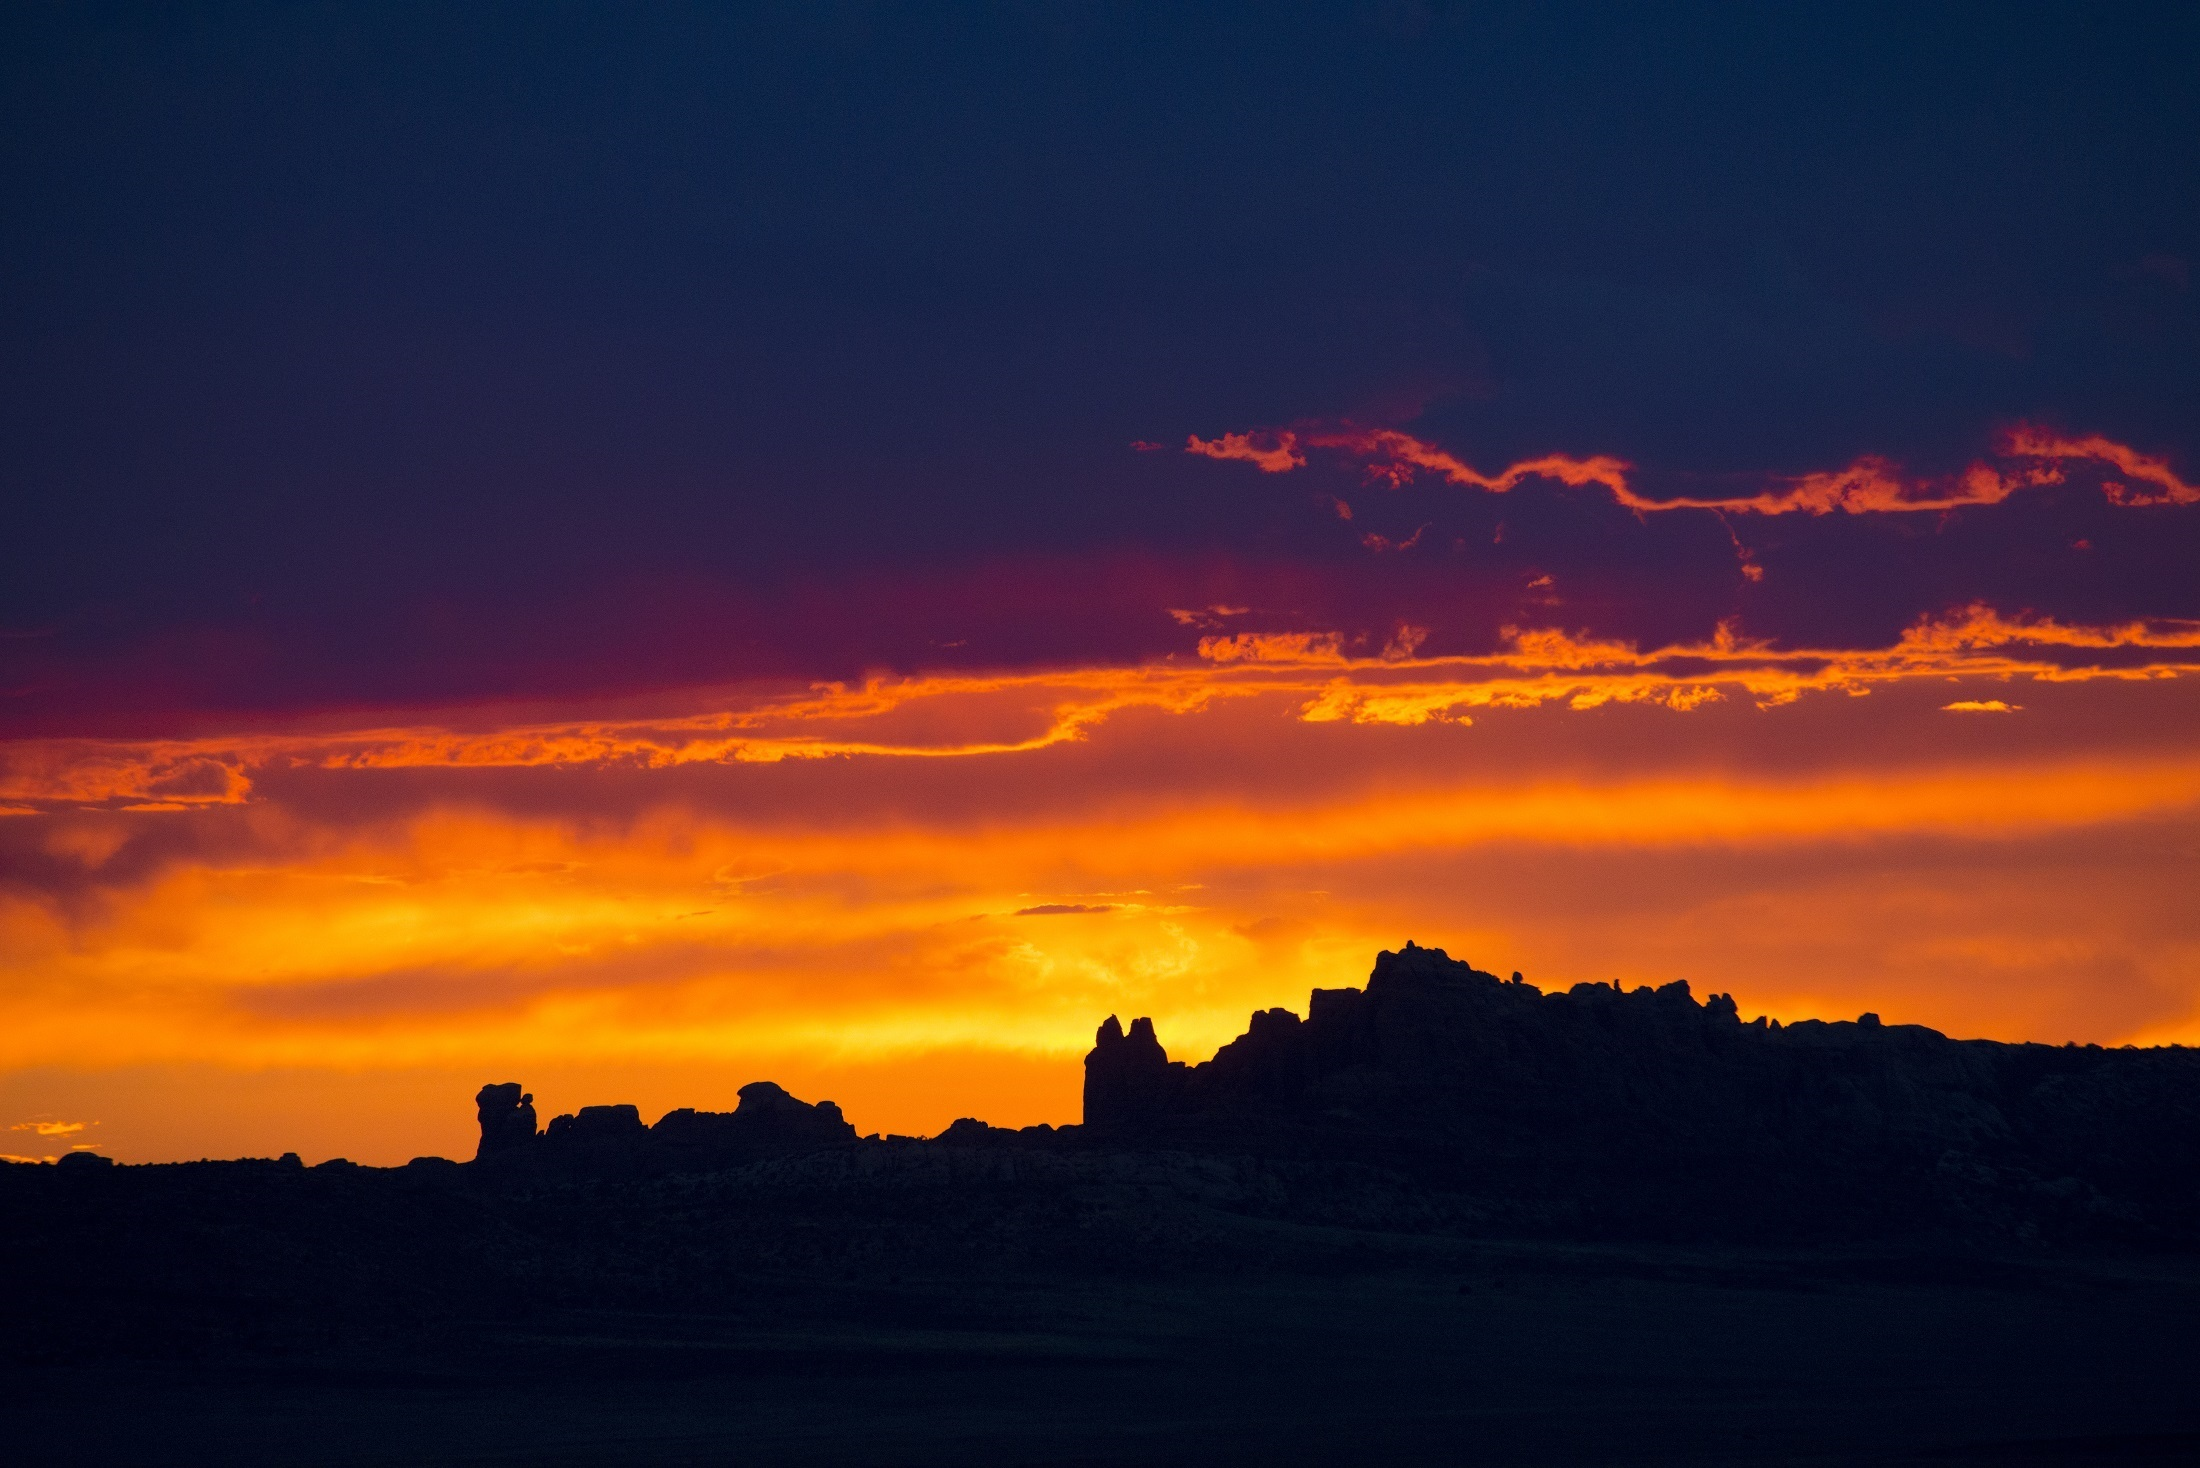 Arches National Park Dusk Earth Hill Nature Silhouette Sky Sunset Usa Utah Orange Color 2200x1468